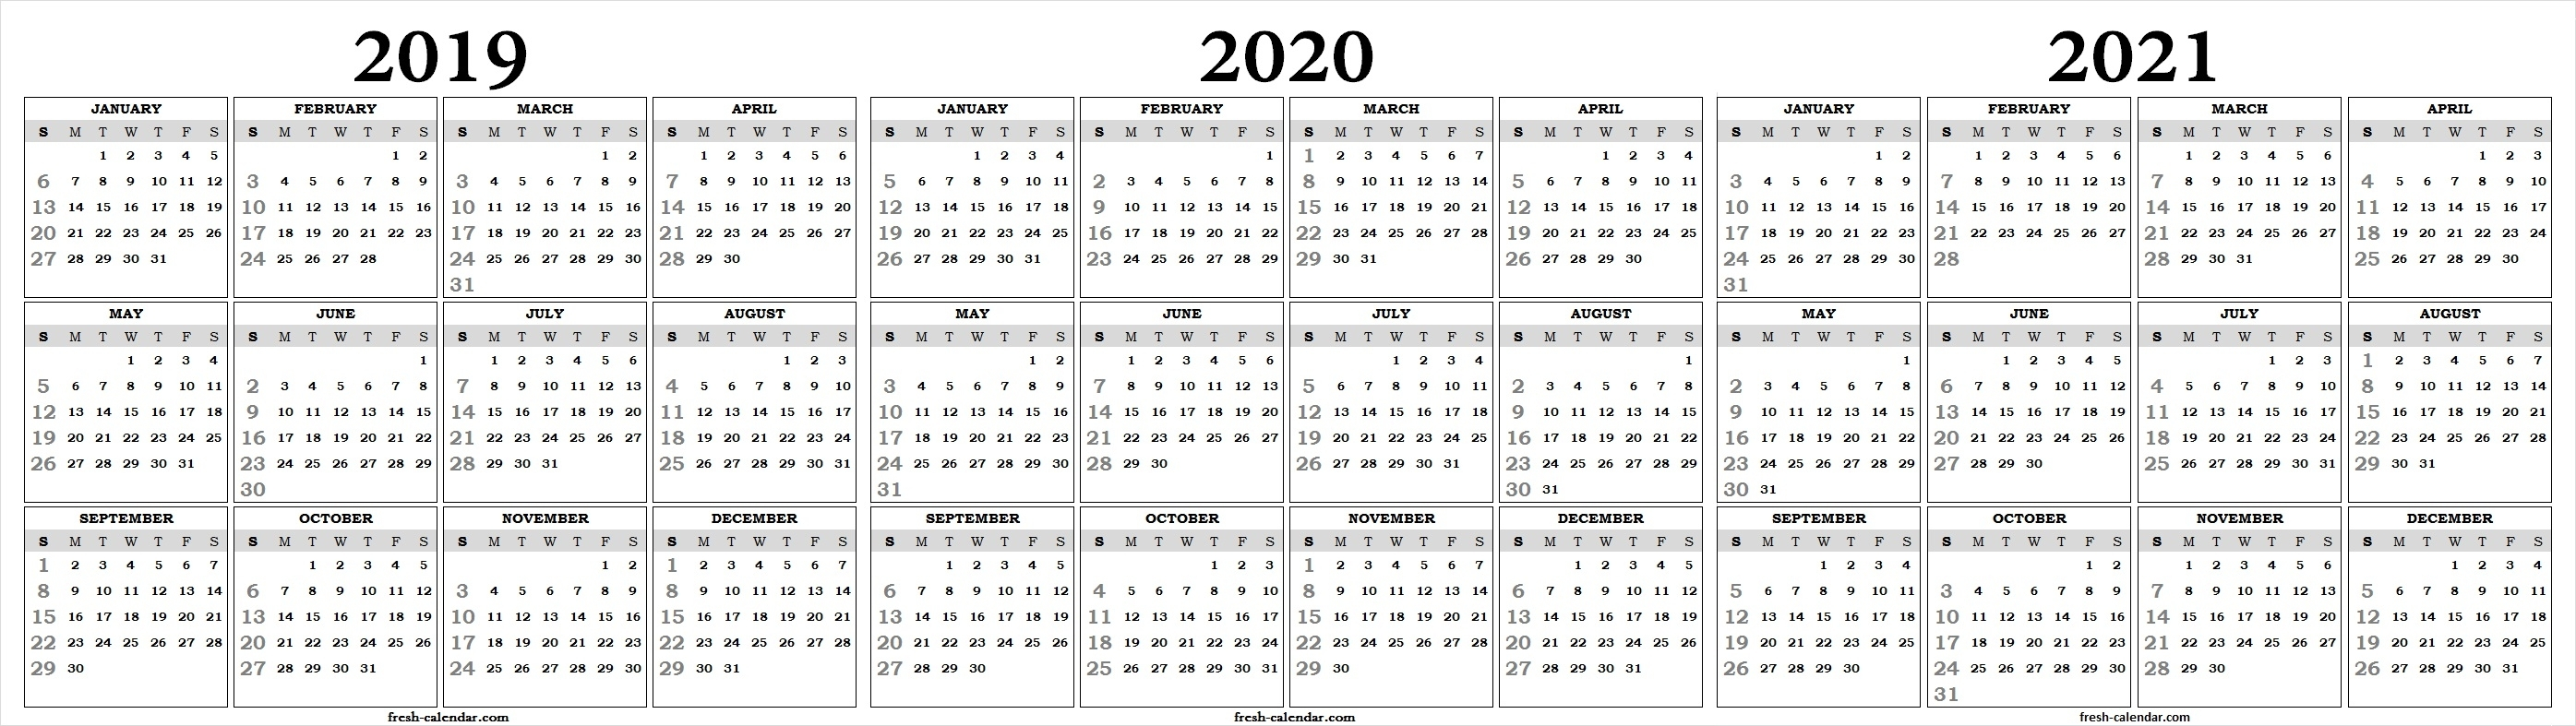 Three Yearly 2019 2020 2021 Calendar Printable Free | Blank Template inside Three Year Calendar 2019 2020 2021